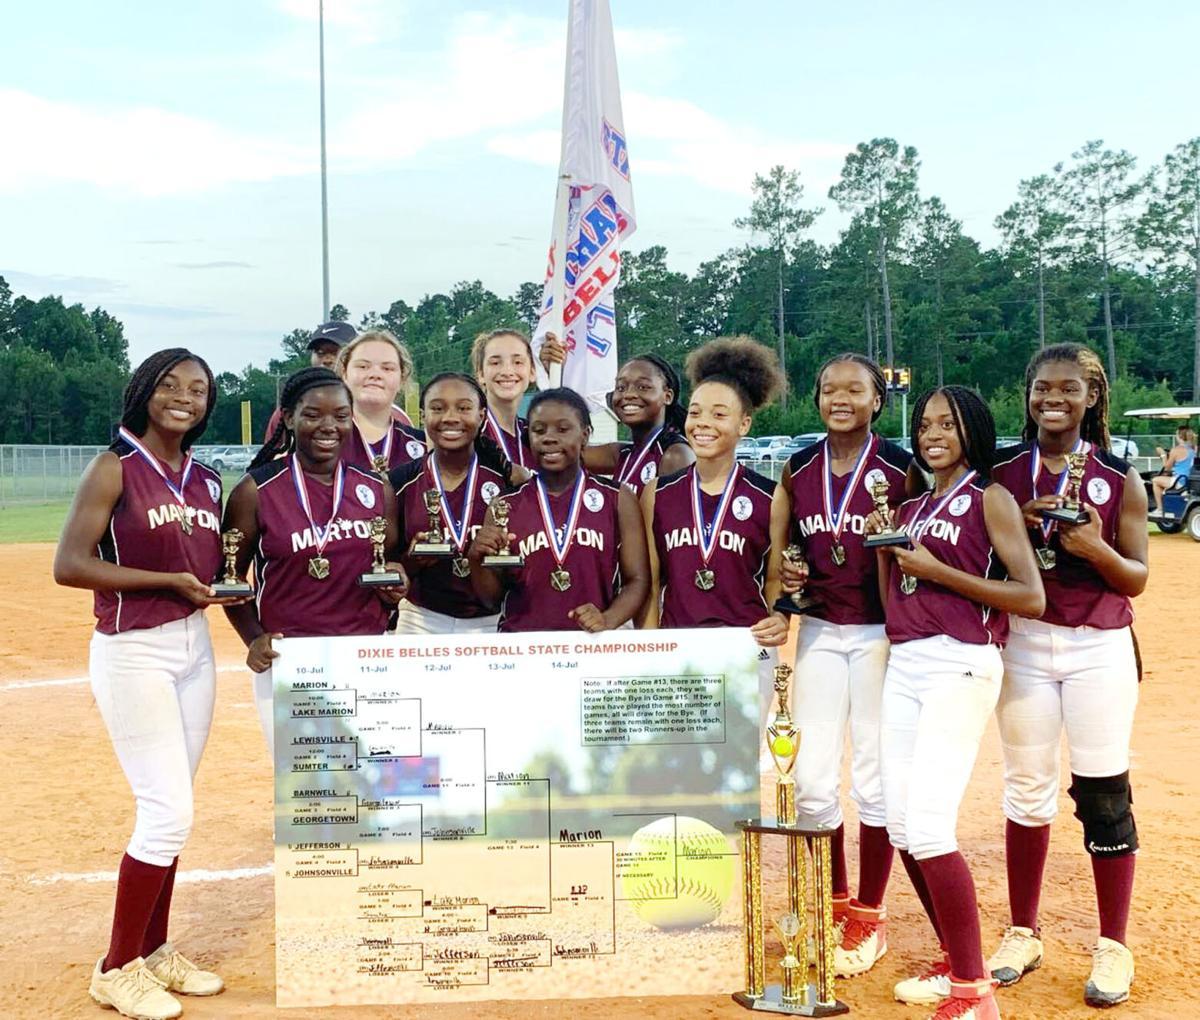 Marion Belles capture Dixie Belles Softball State Championship